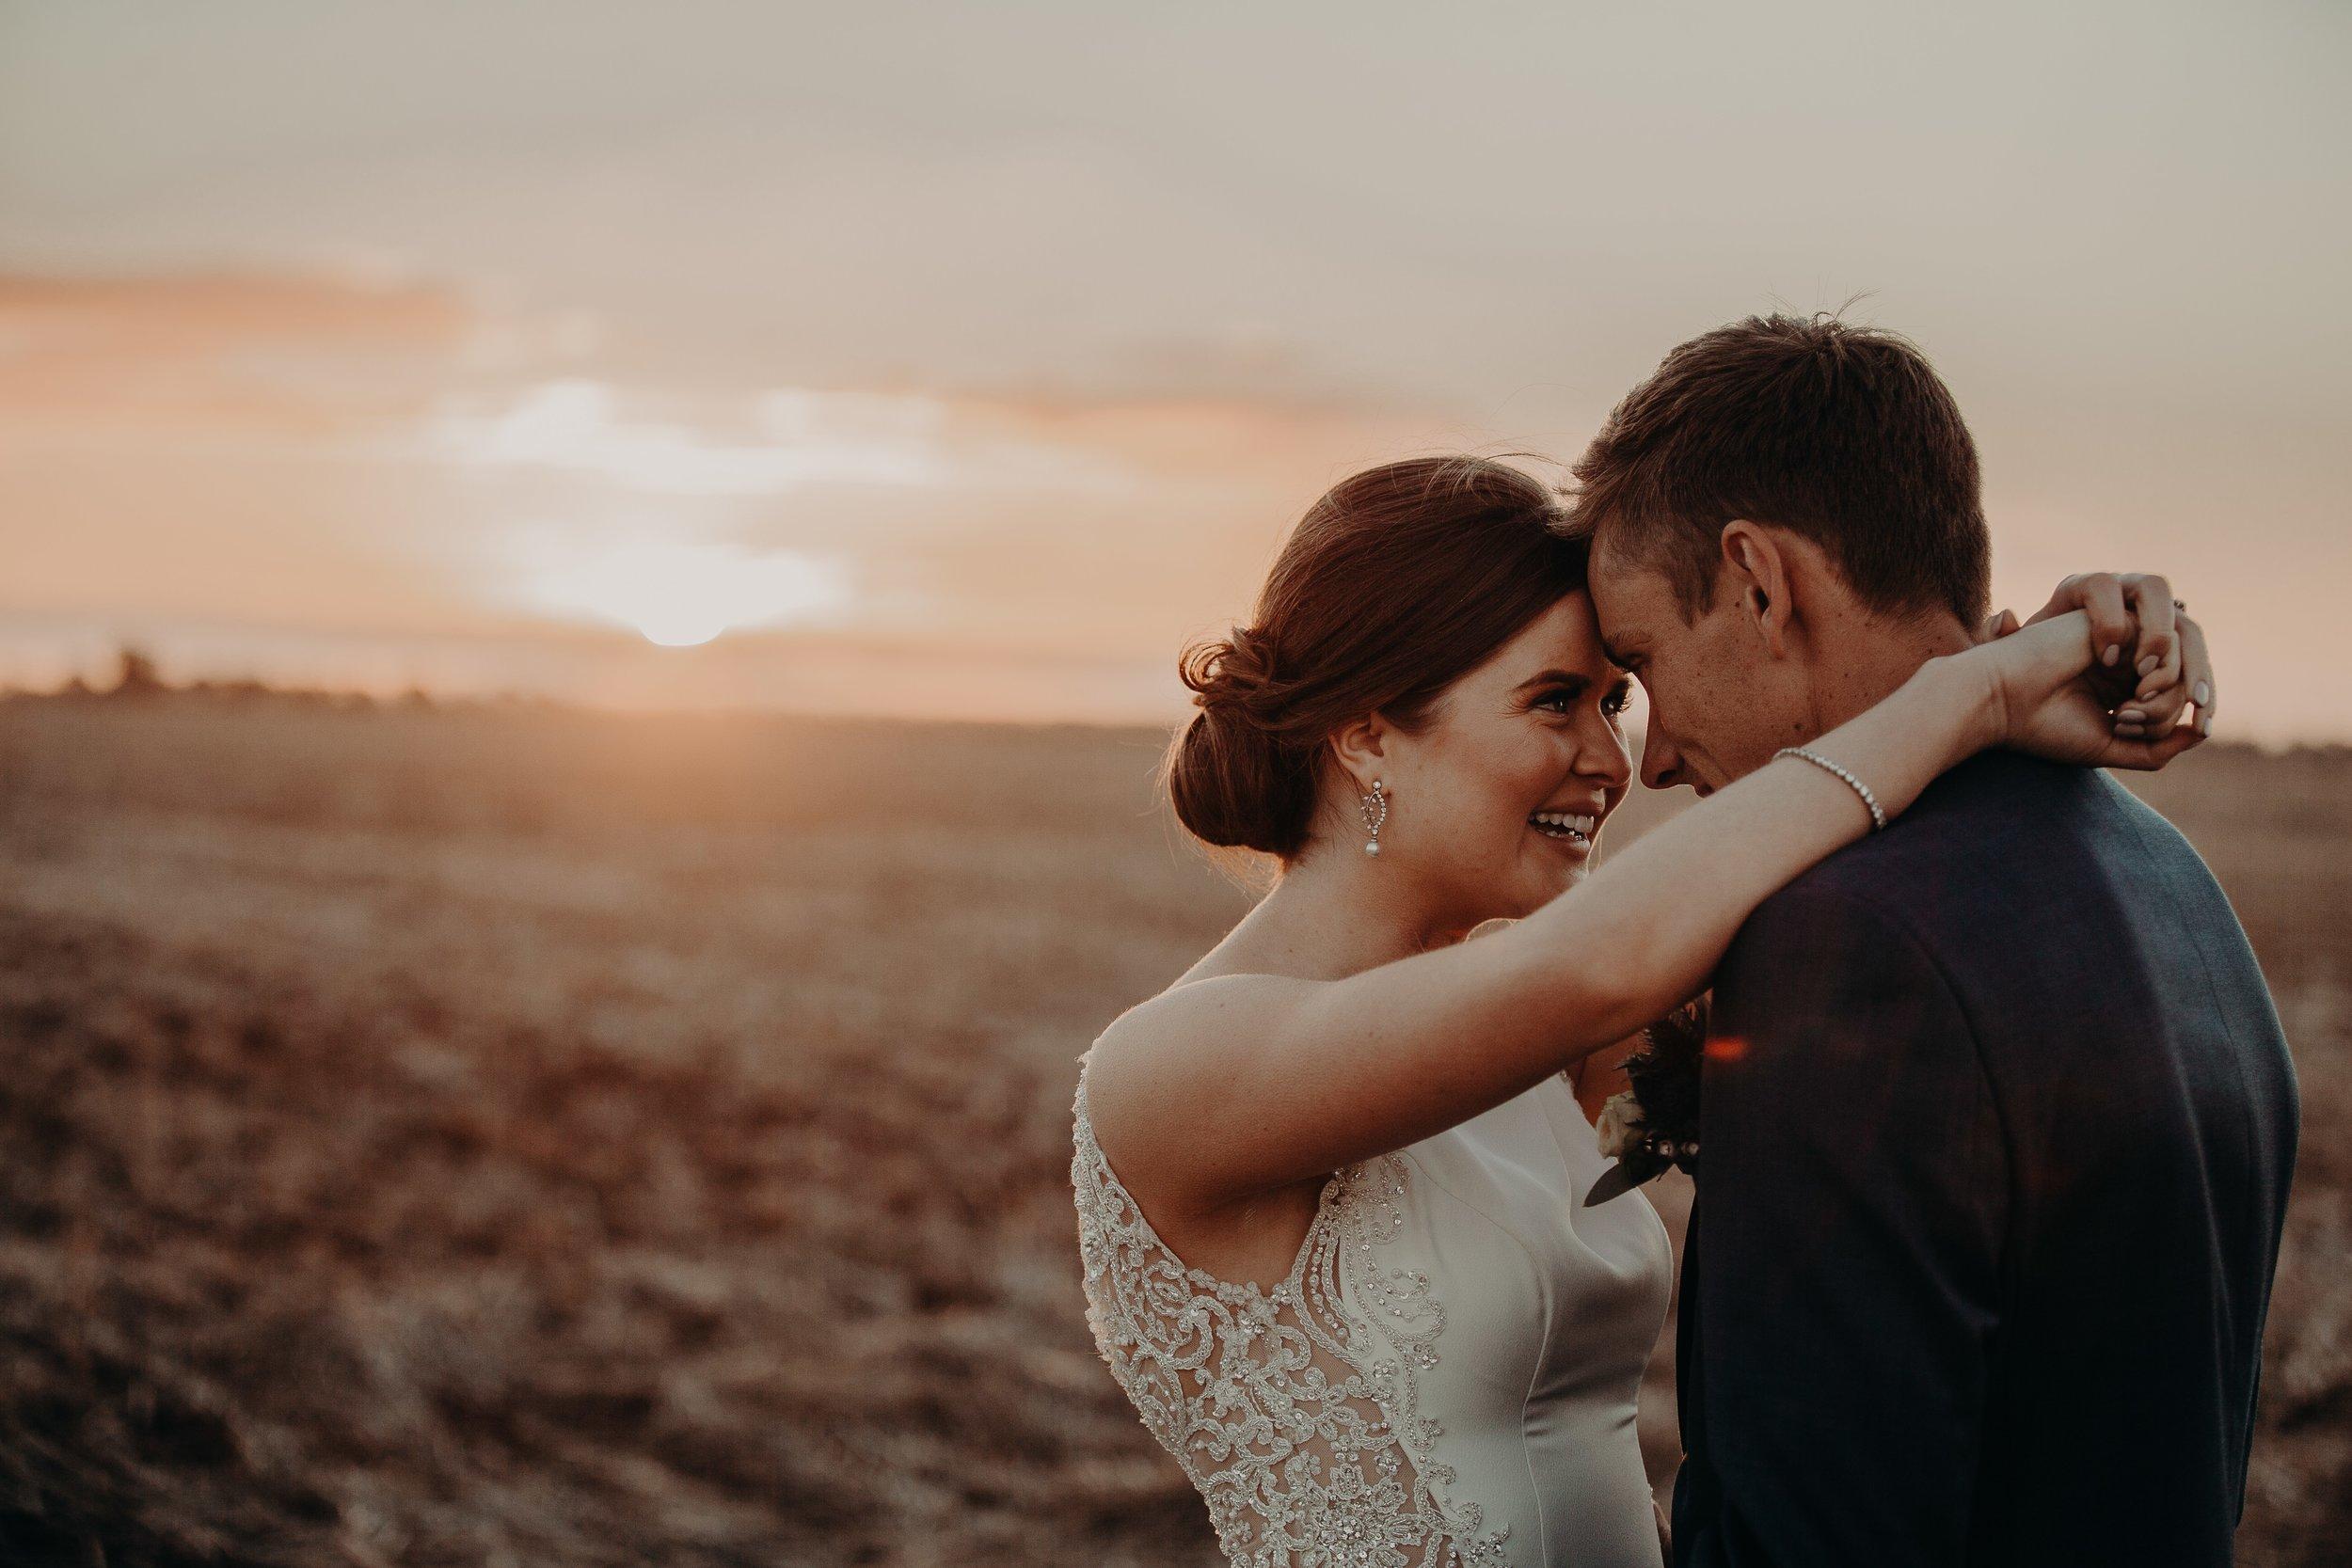 mickalathomas_puremacphotography_weddingphotographer_couplephotographer_Sheppartonphotographer_2573.jpg